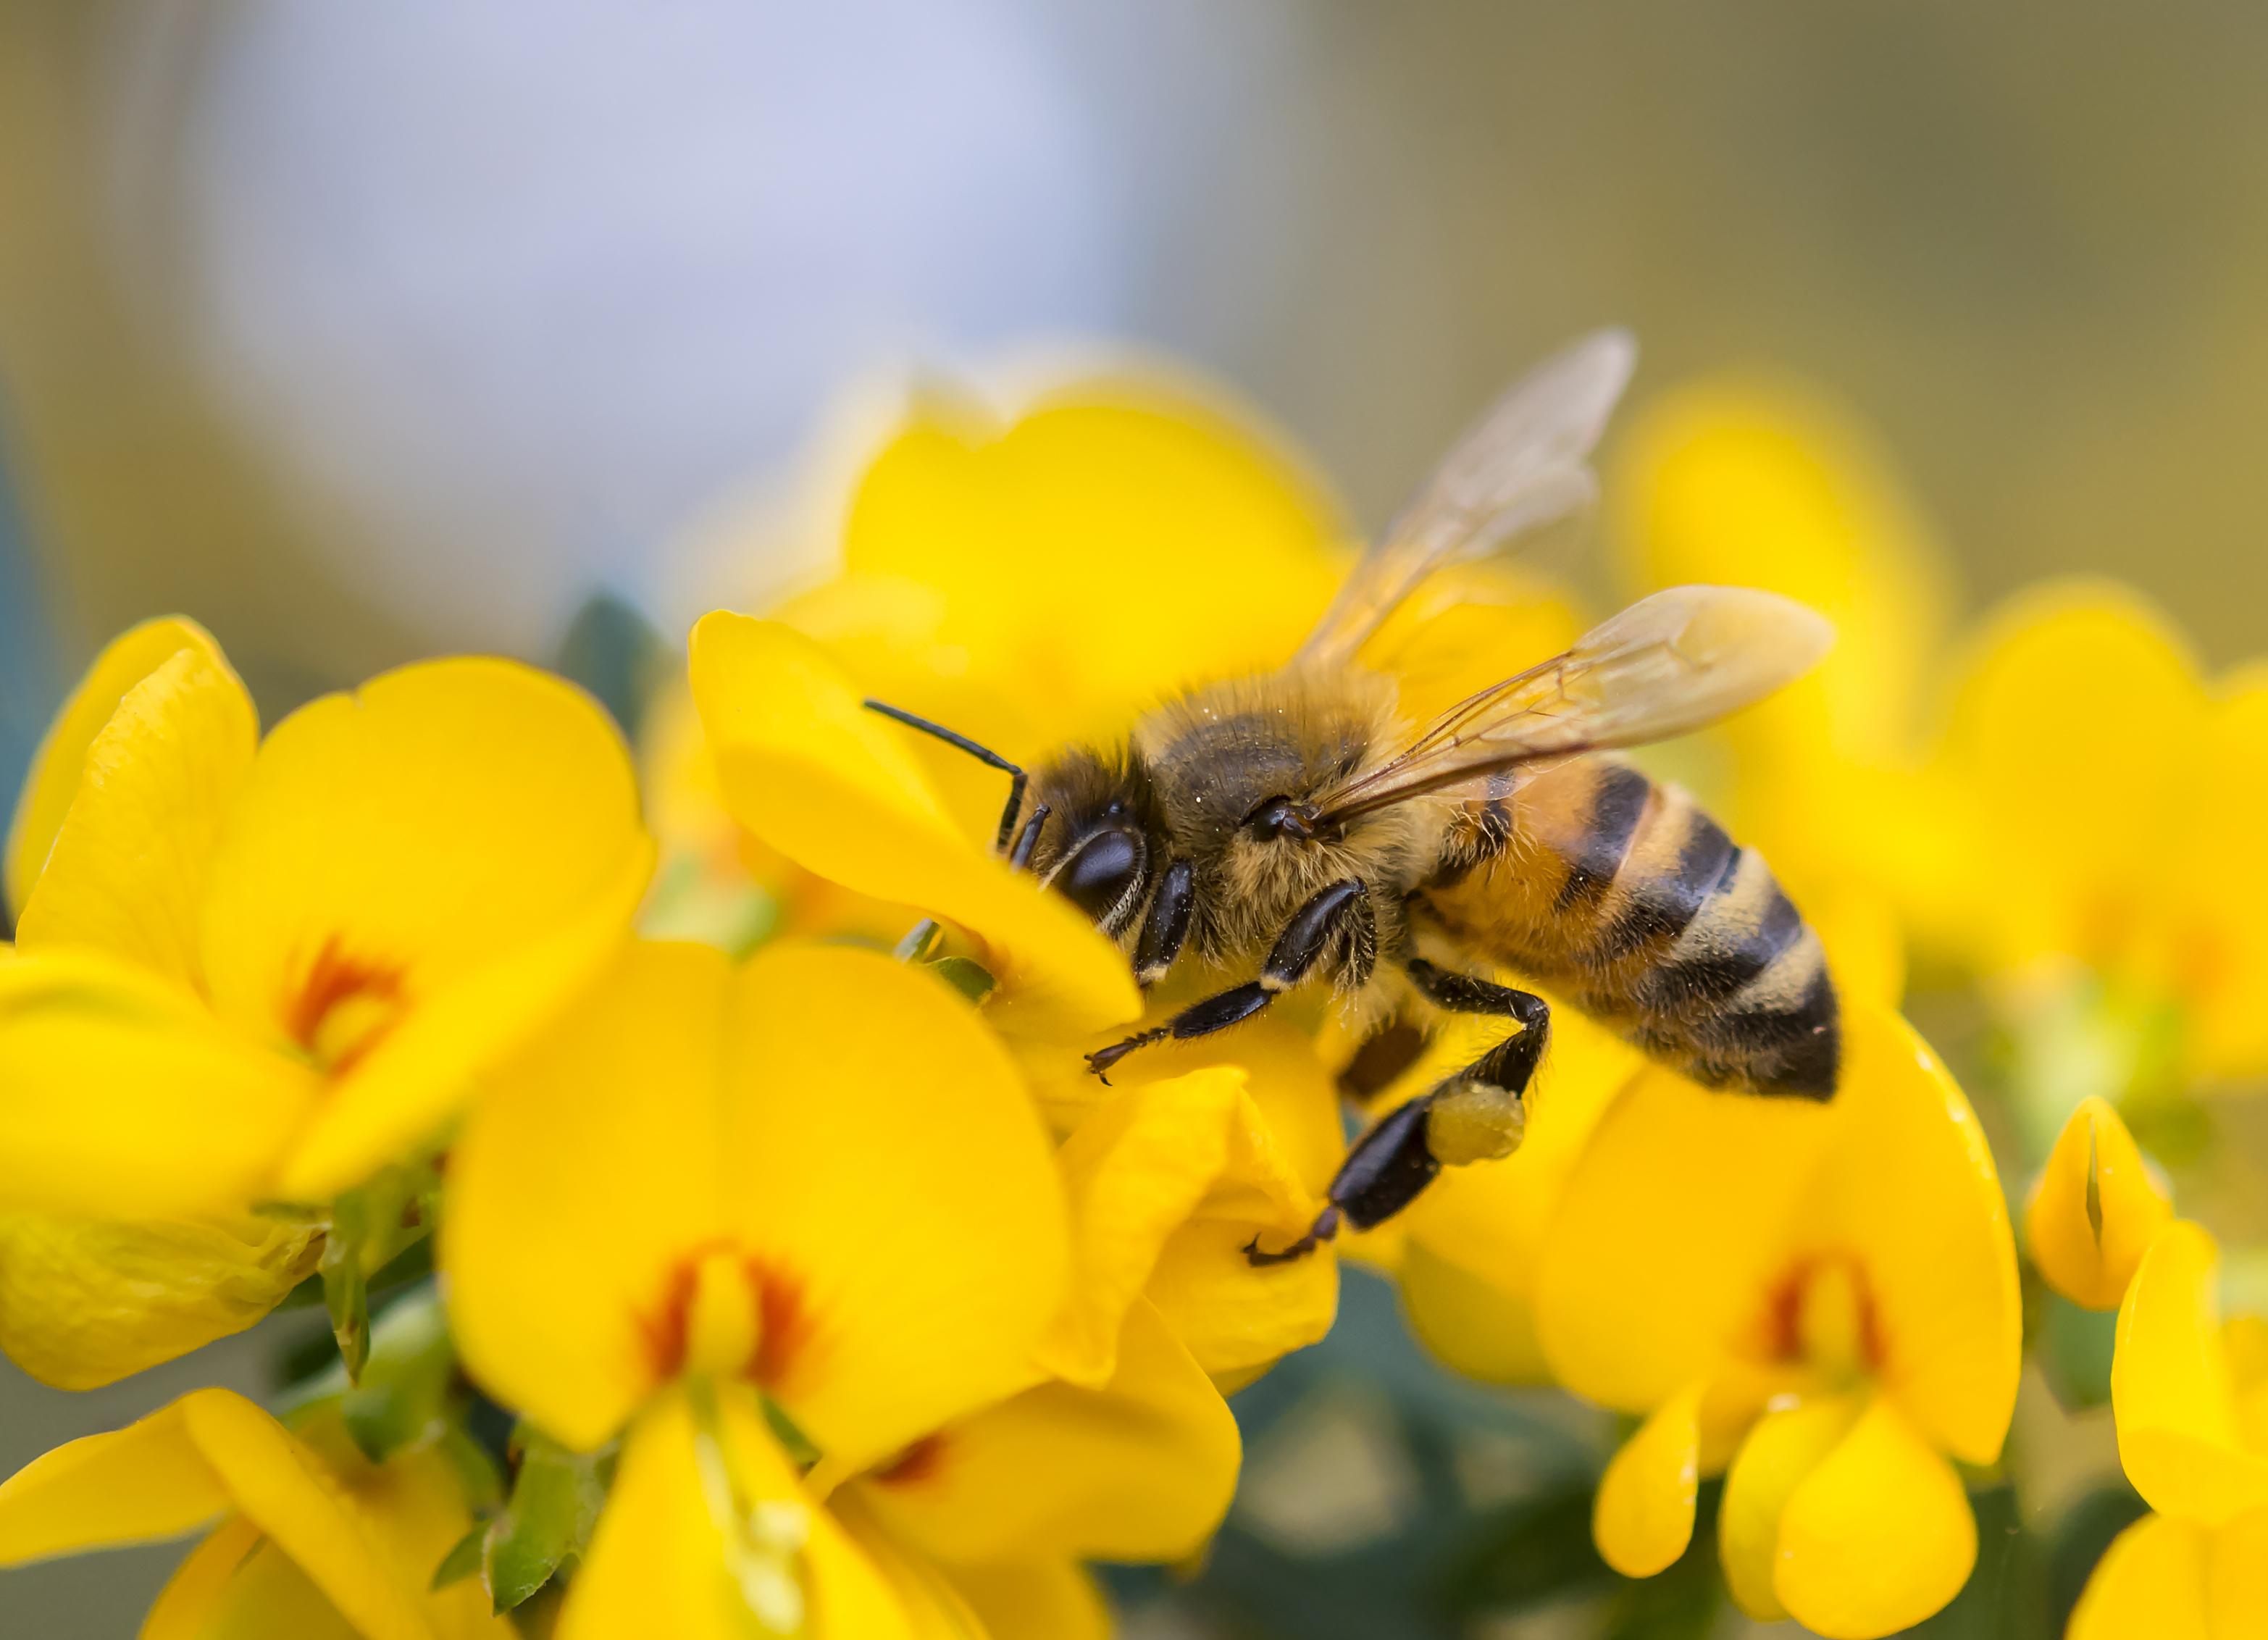 Advantages & Disadvantages of Honeybees